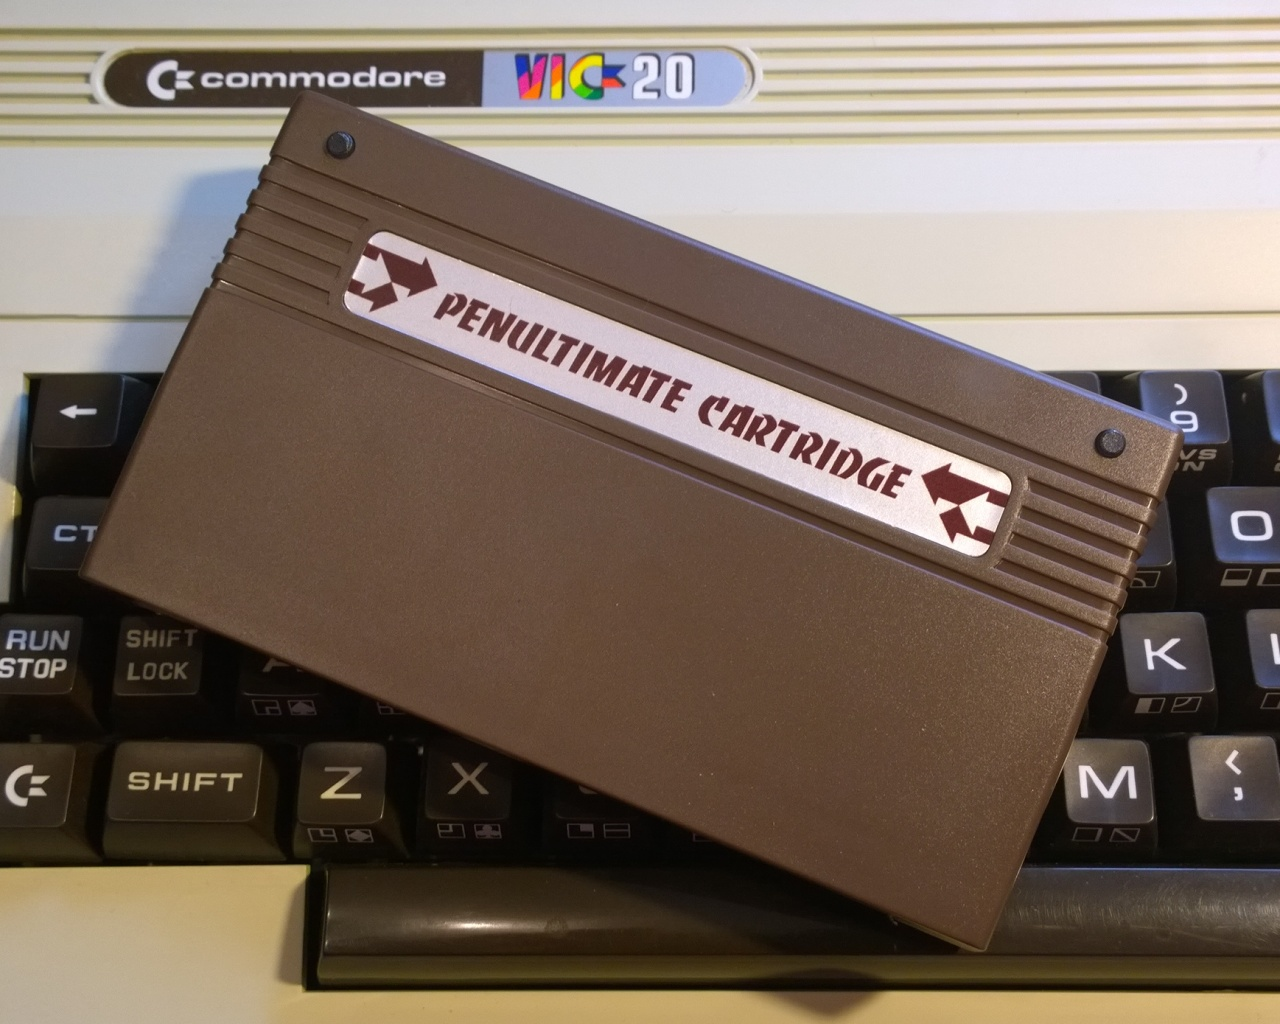 Penultimate Cartridge VIC20 Batch 2